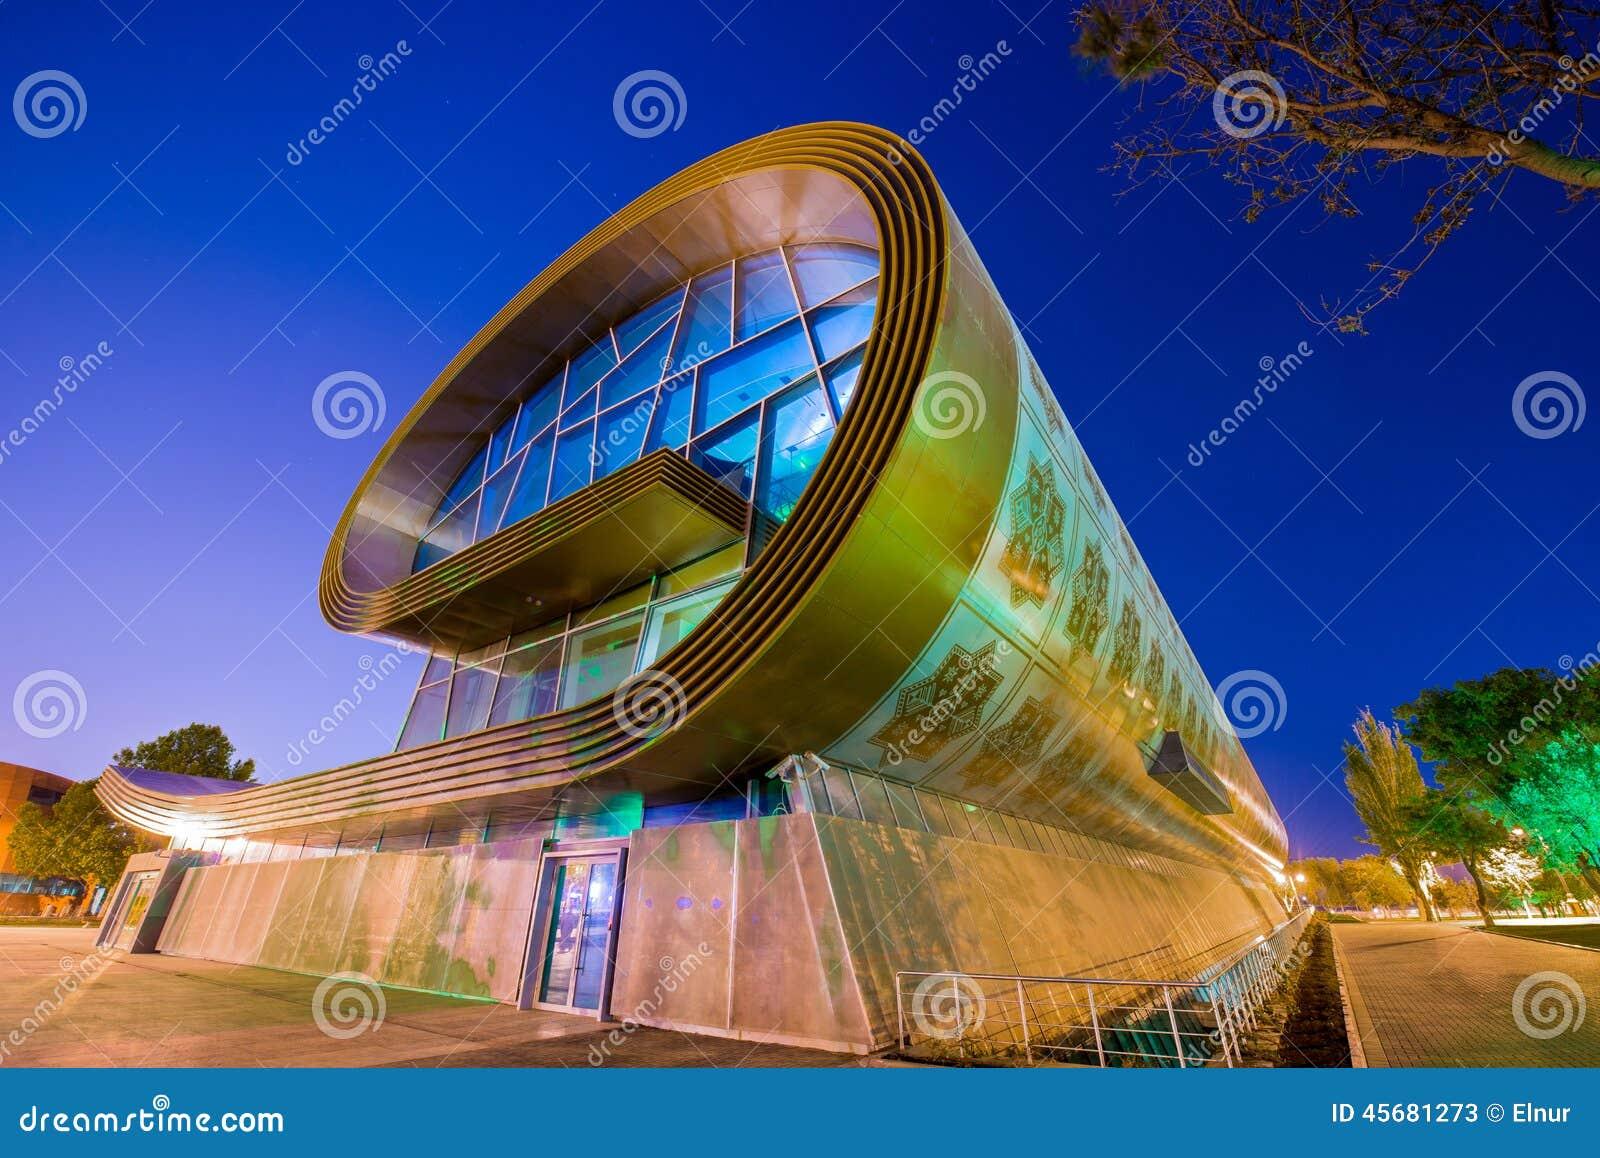 TeppichMuseum Am 30 Mai In Baku, Aserbaidschan